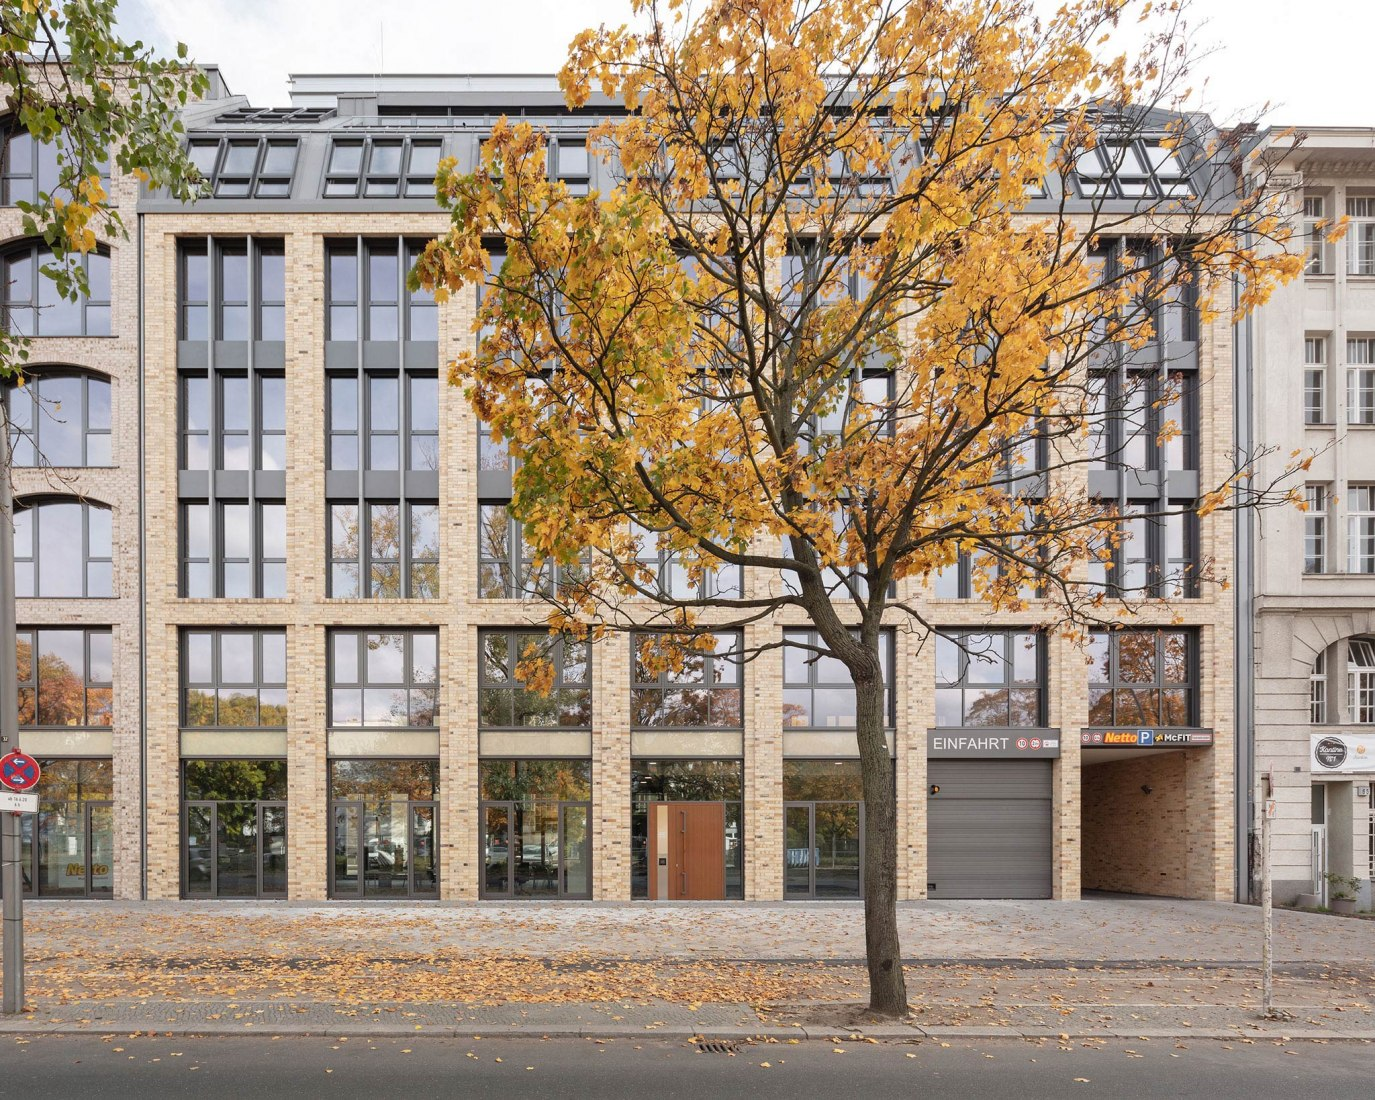 Seestrasse 65-66 Edificio de oficinas por Tchoban Voss Architekten. Fotografía por Klemens Renner